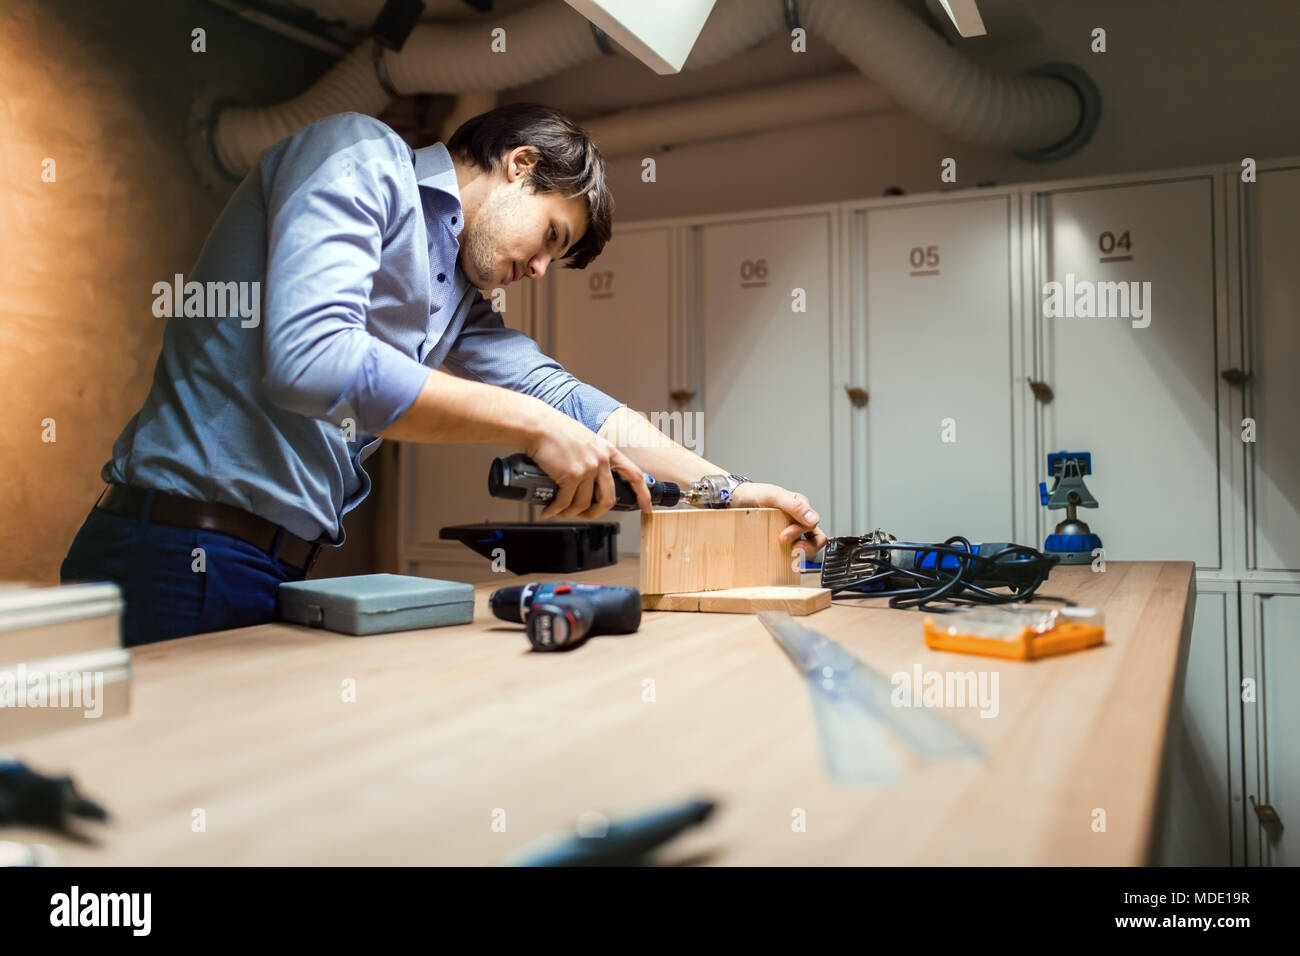 Handyman working with wood - Stock Image